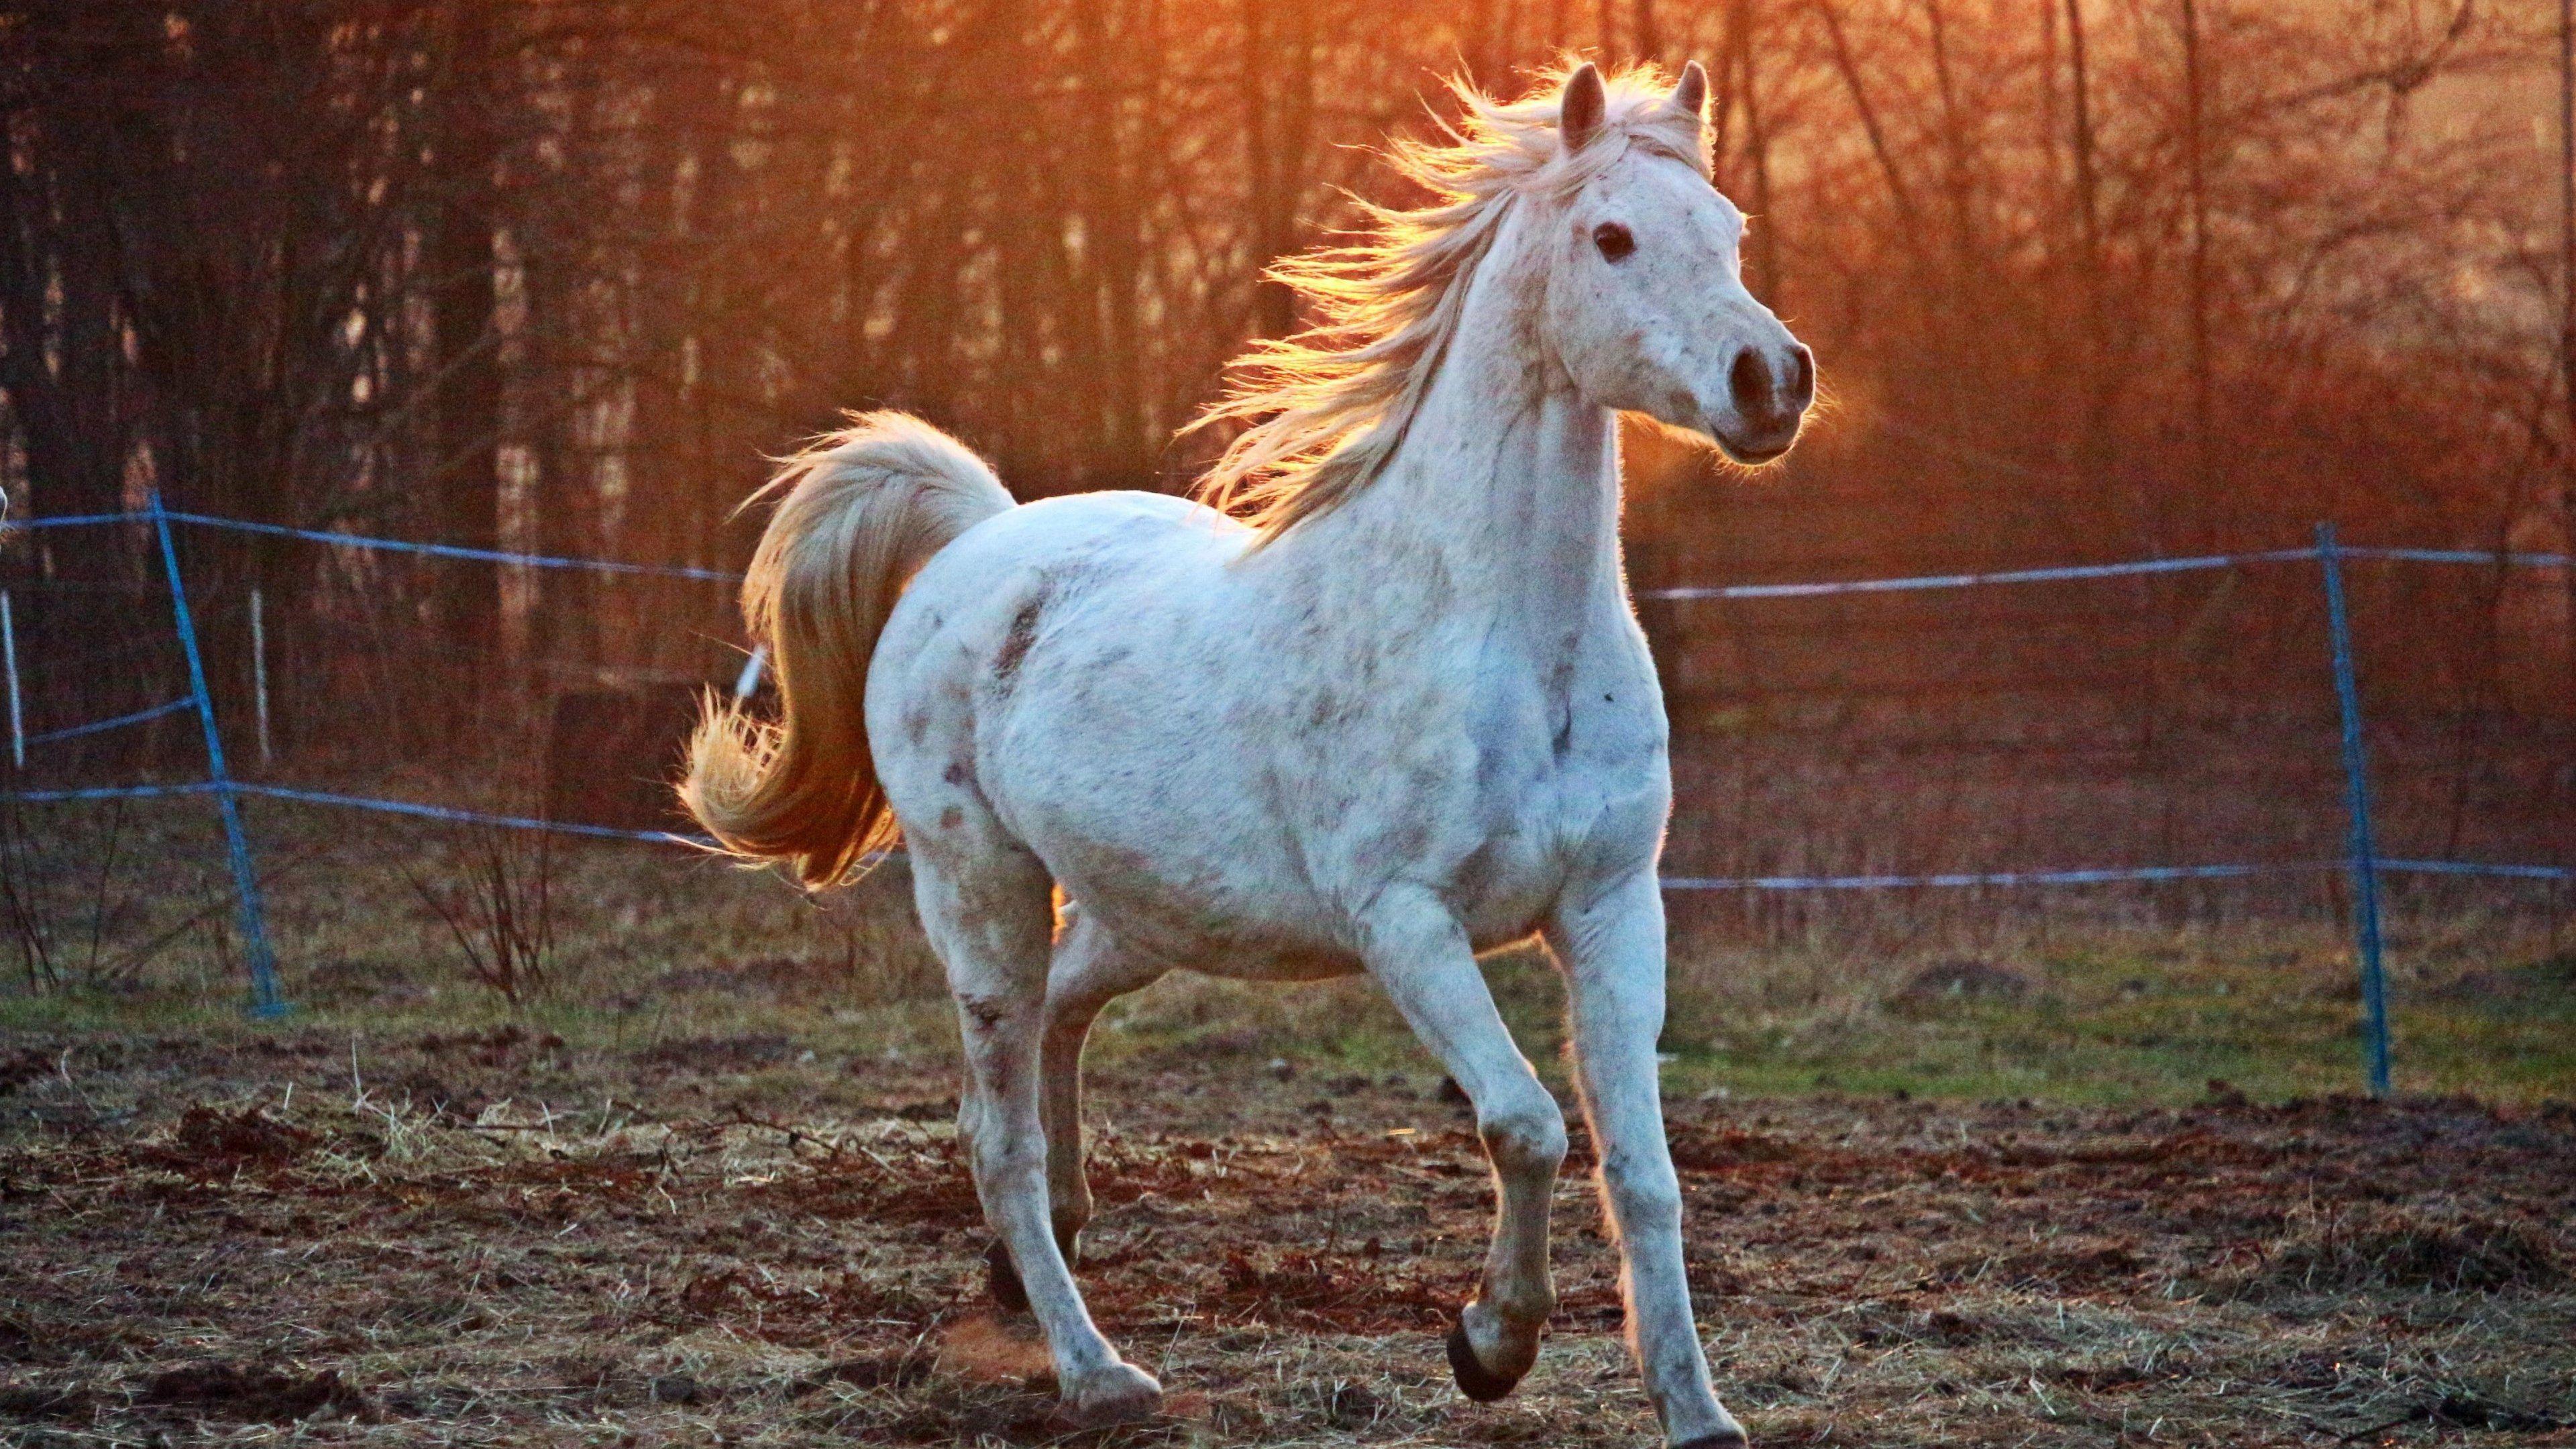 Desktop Wallpaper Hd Horse